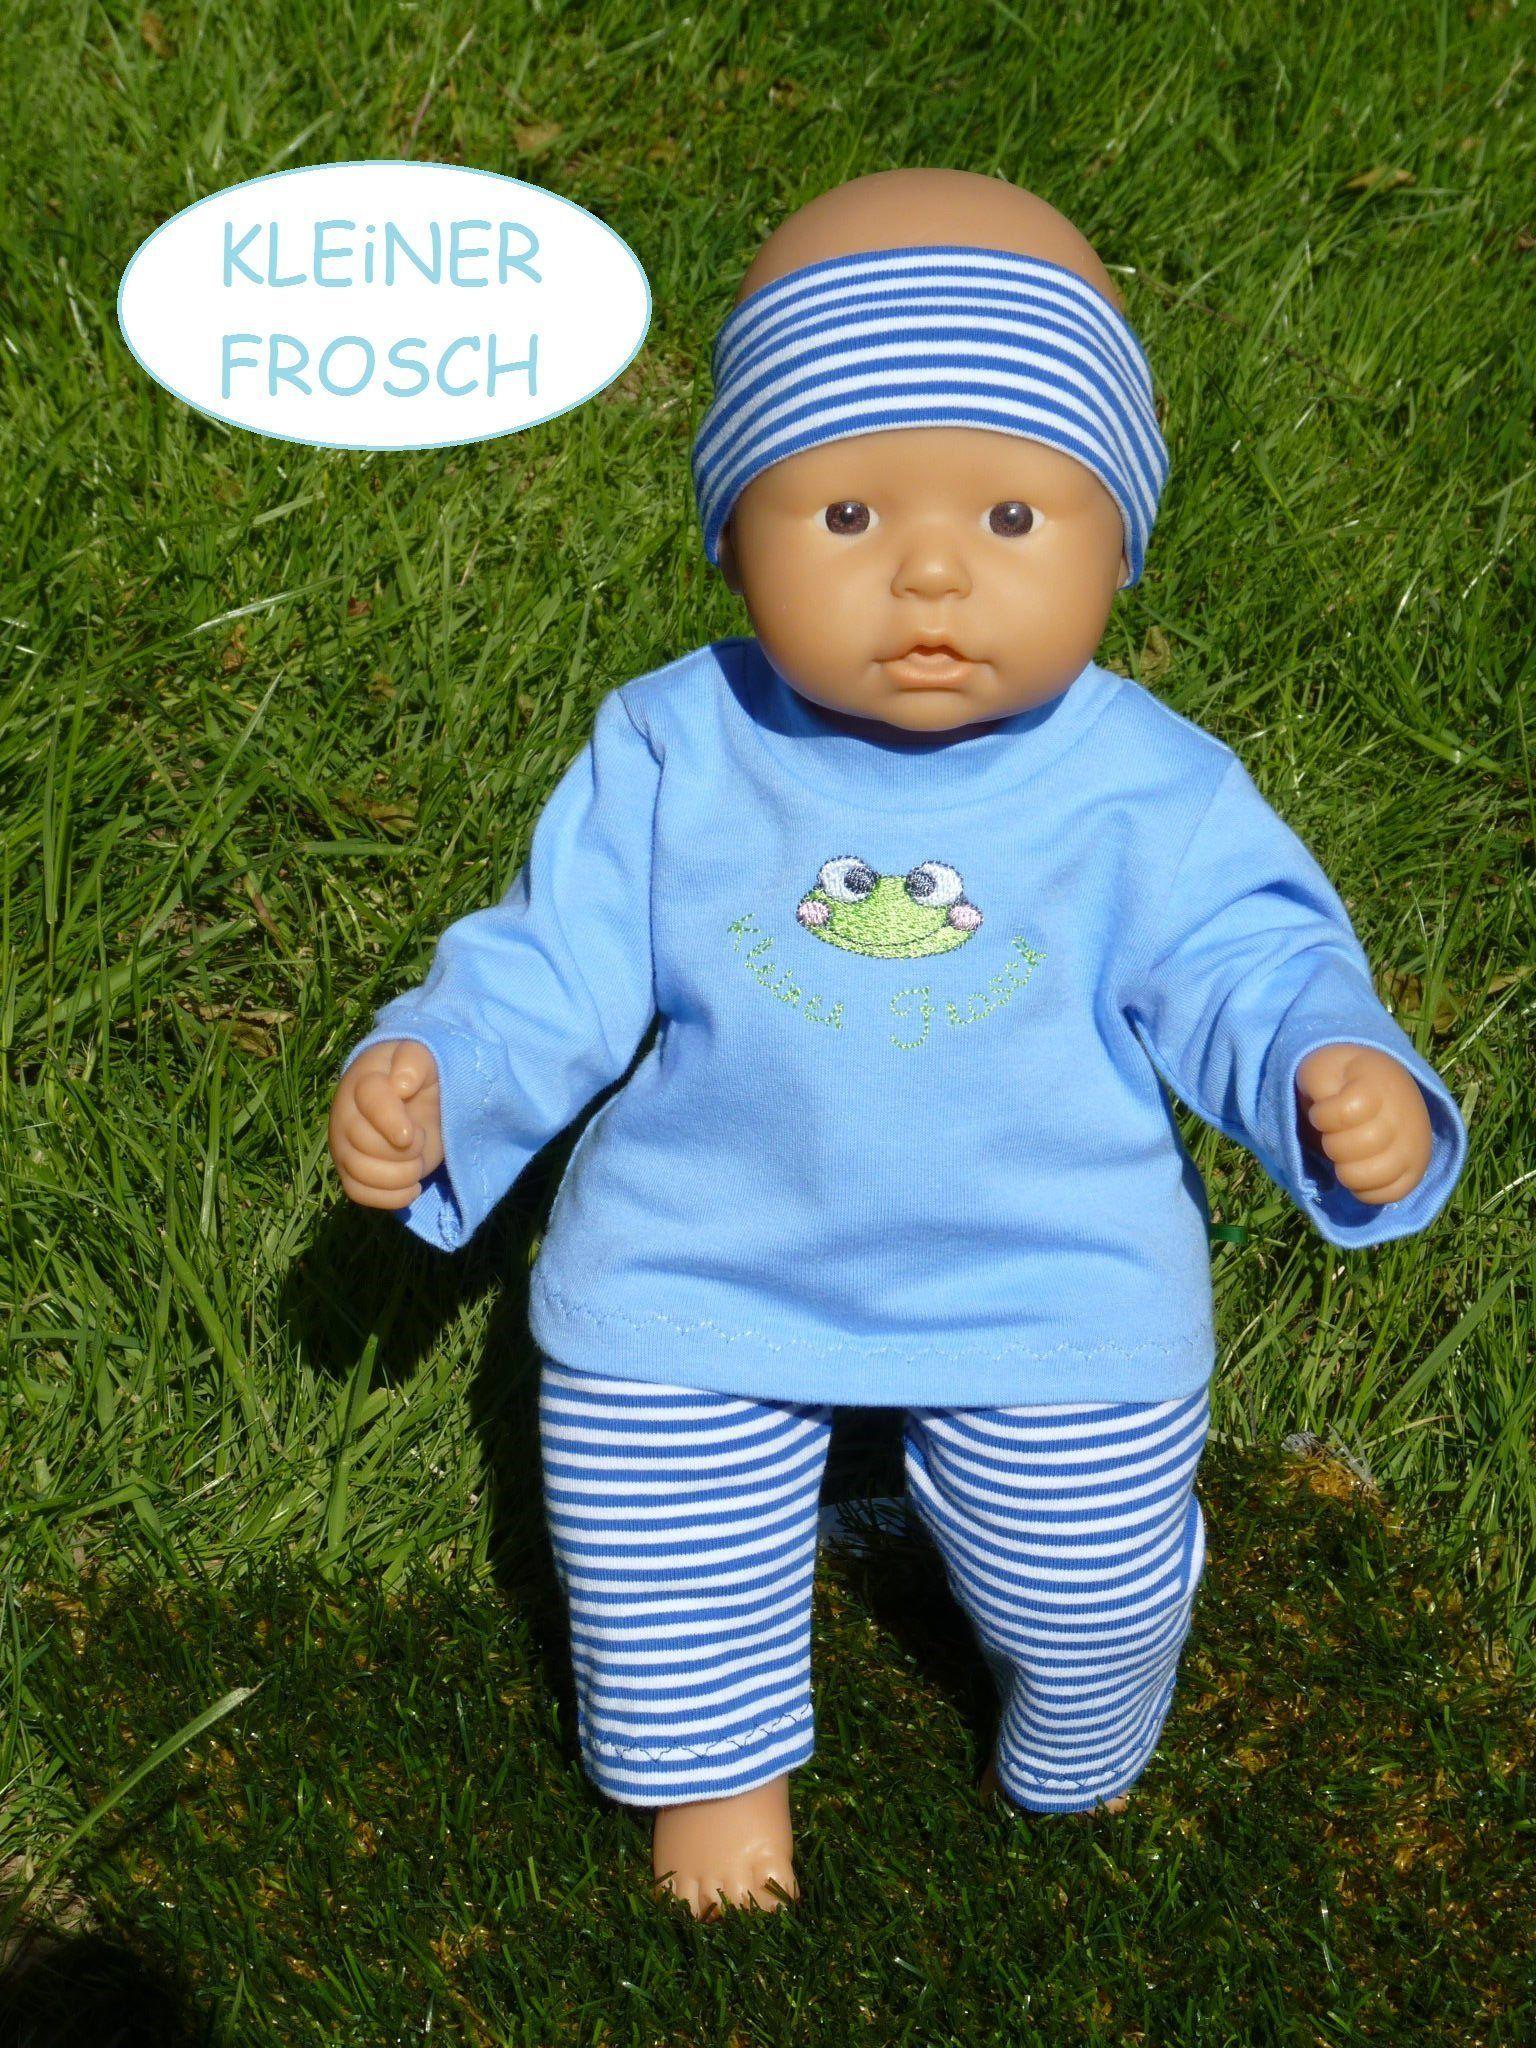 Frosch Setz Mich Auf Stuhl - Projupin5